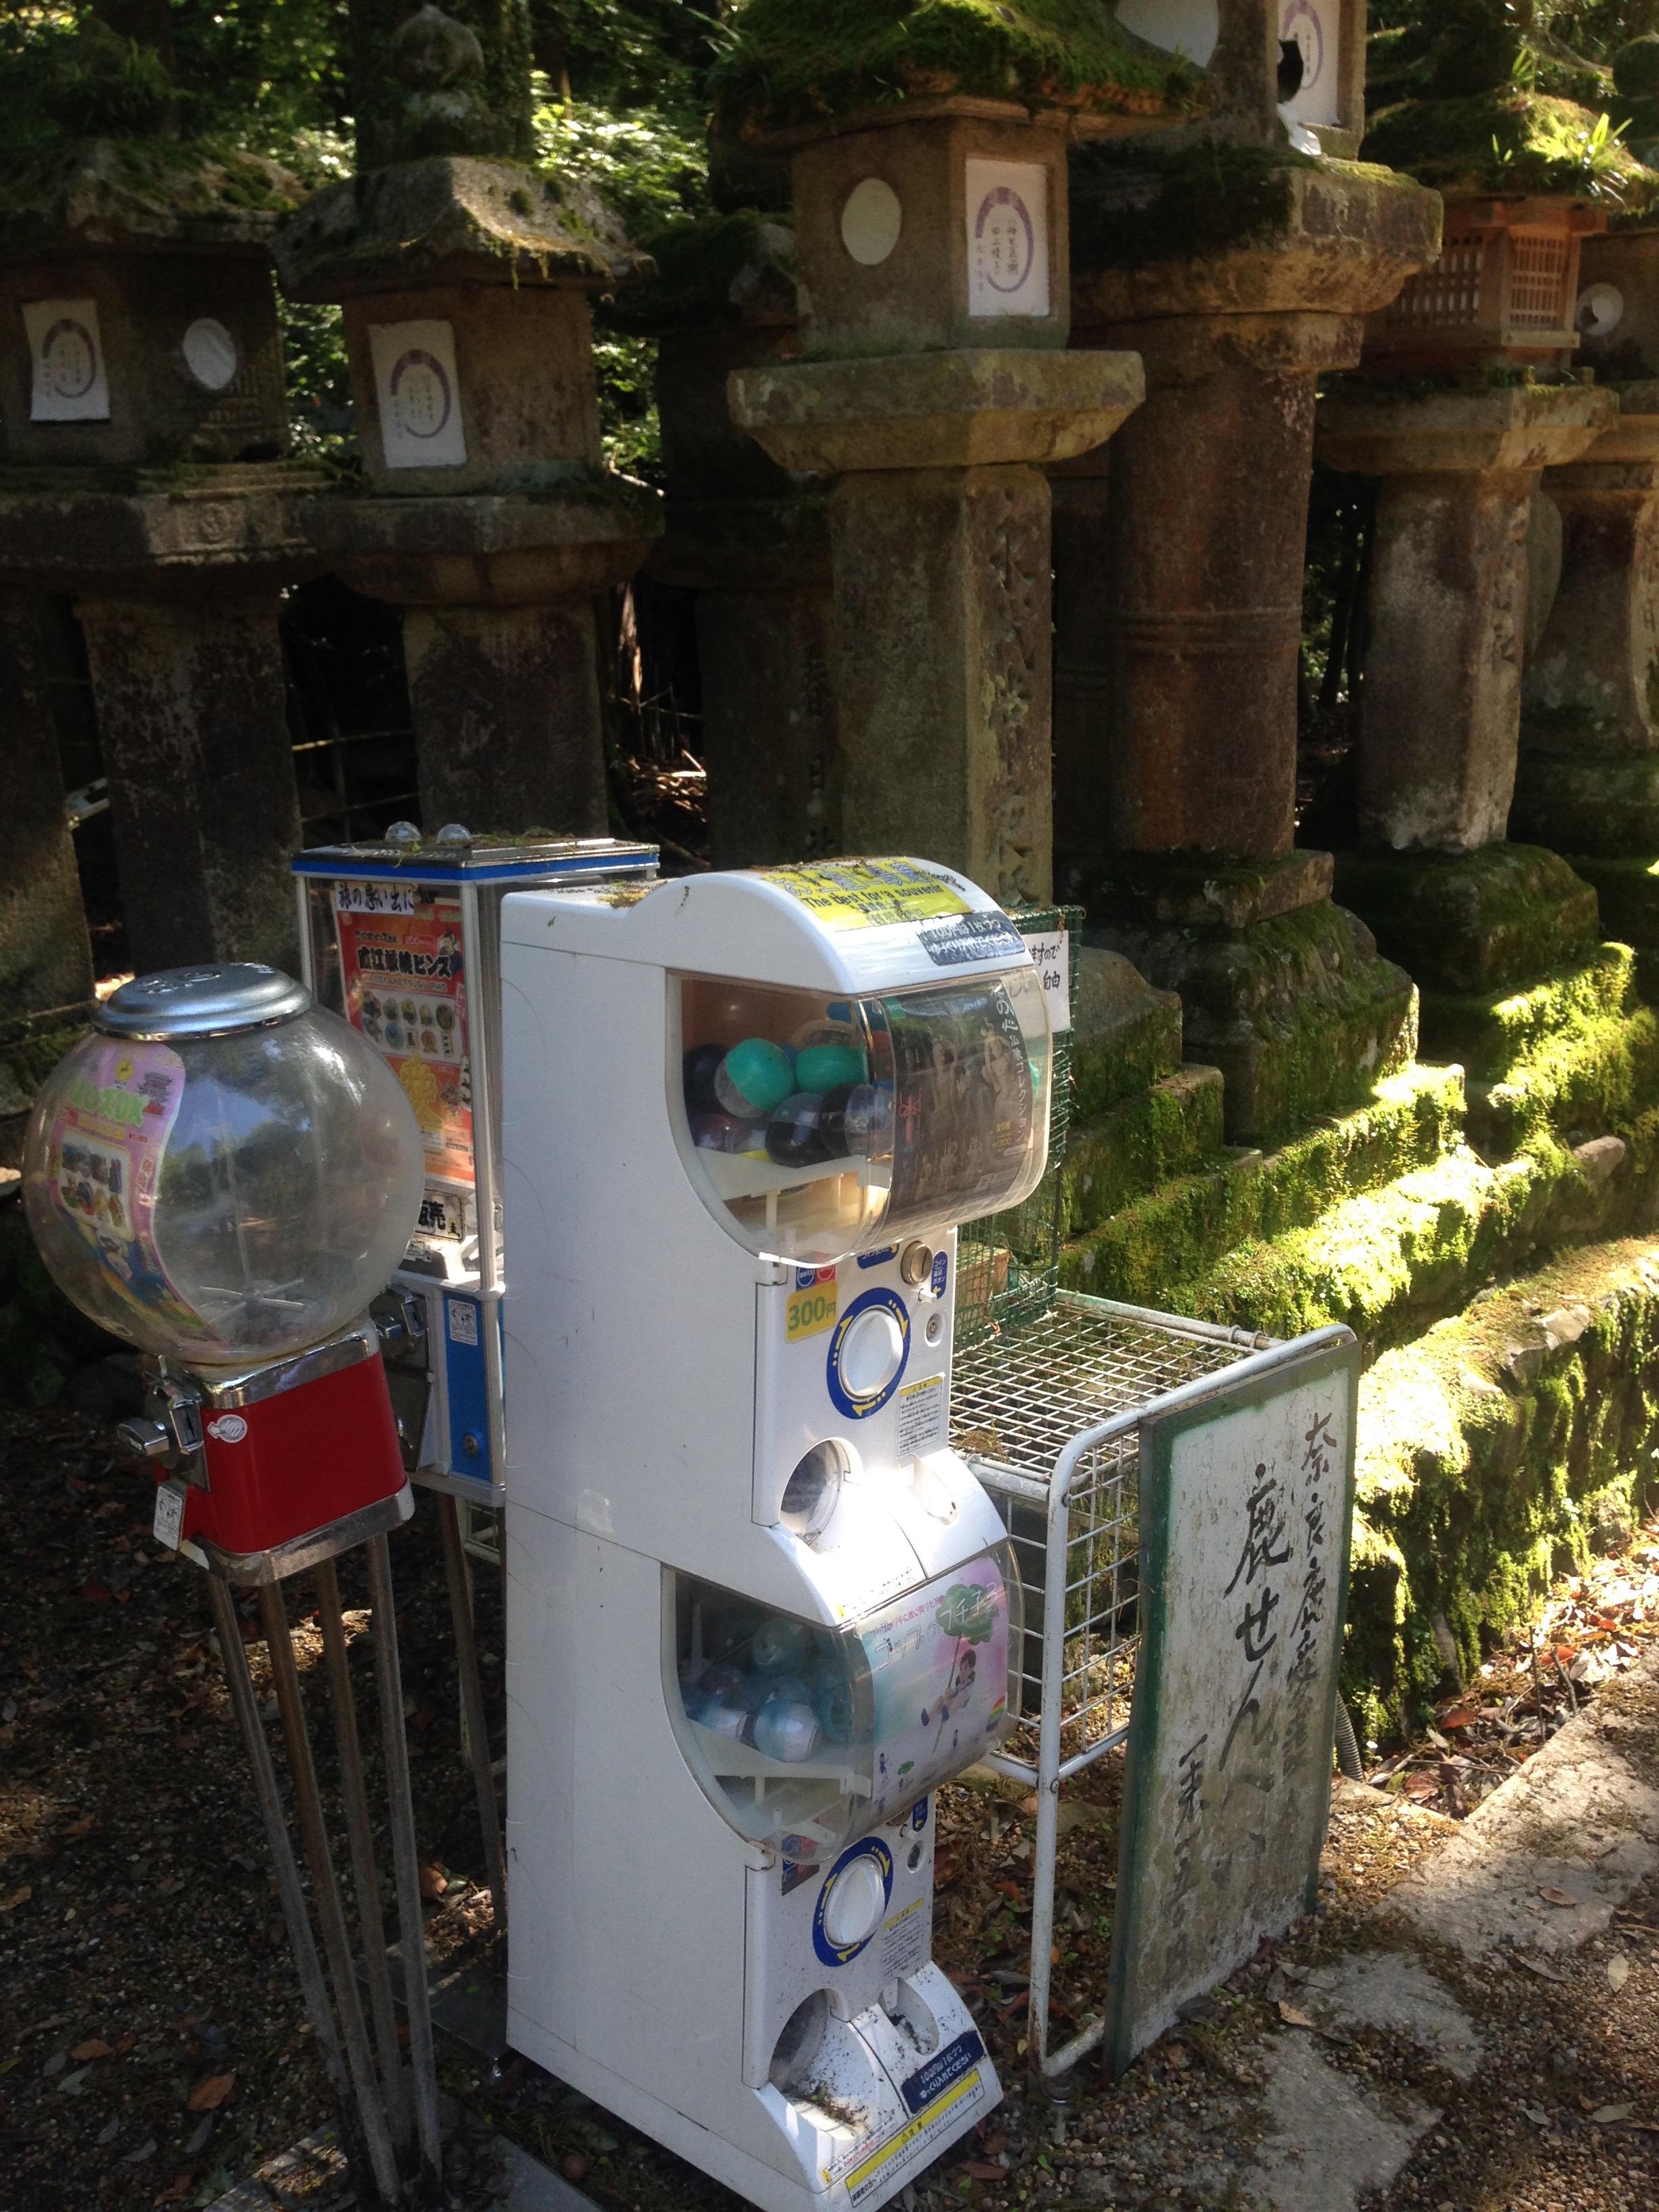 Vending machines next to century old oil lanterns!